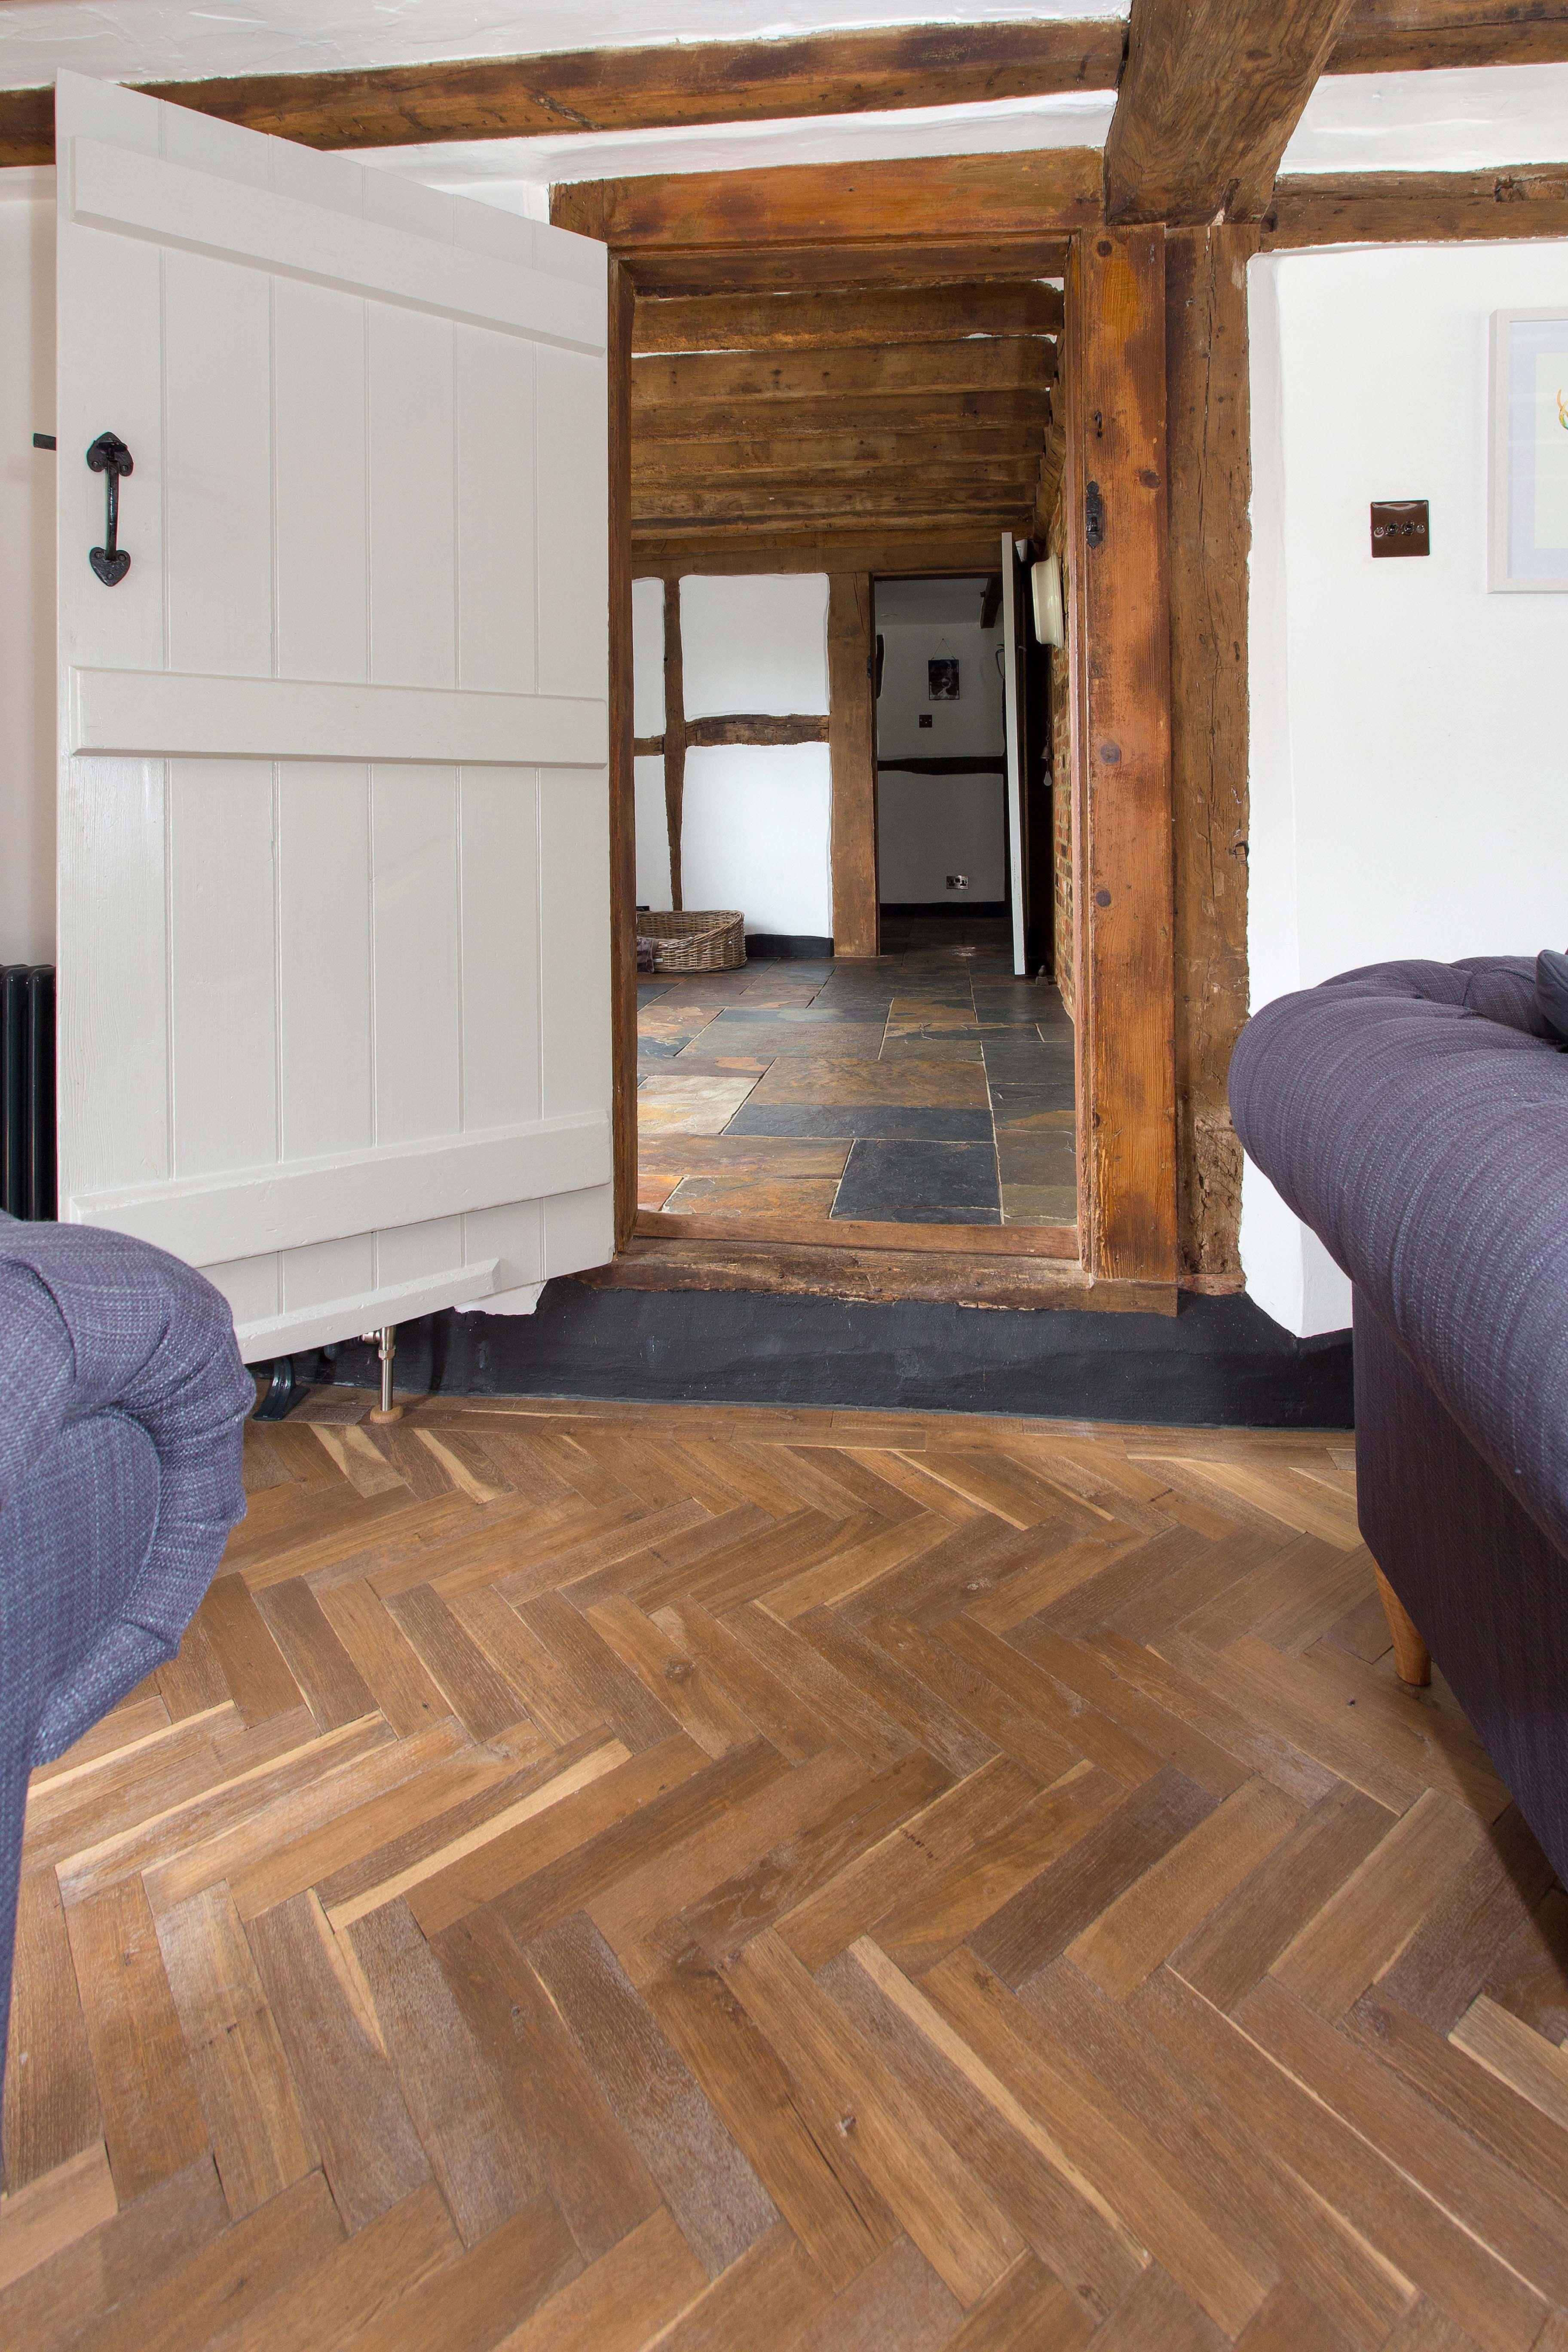 Solid oak parquet herringbone wood flooring with two block